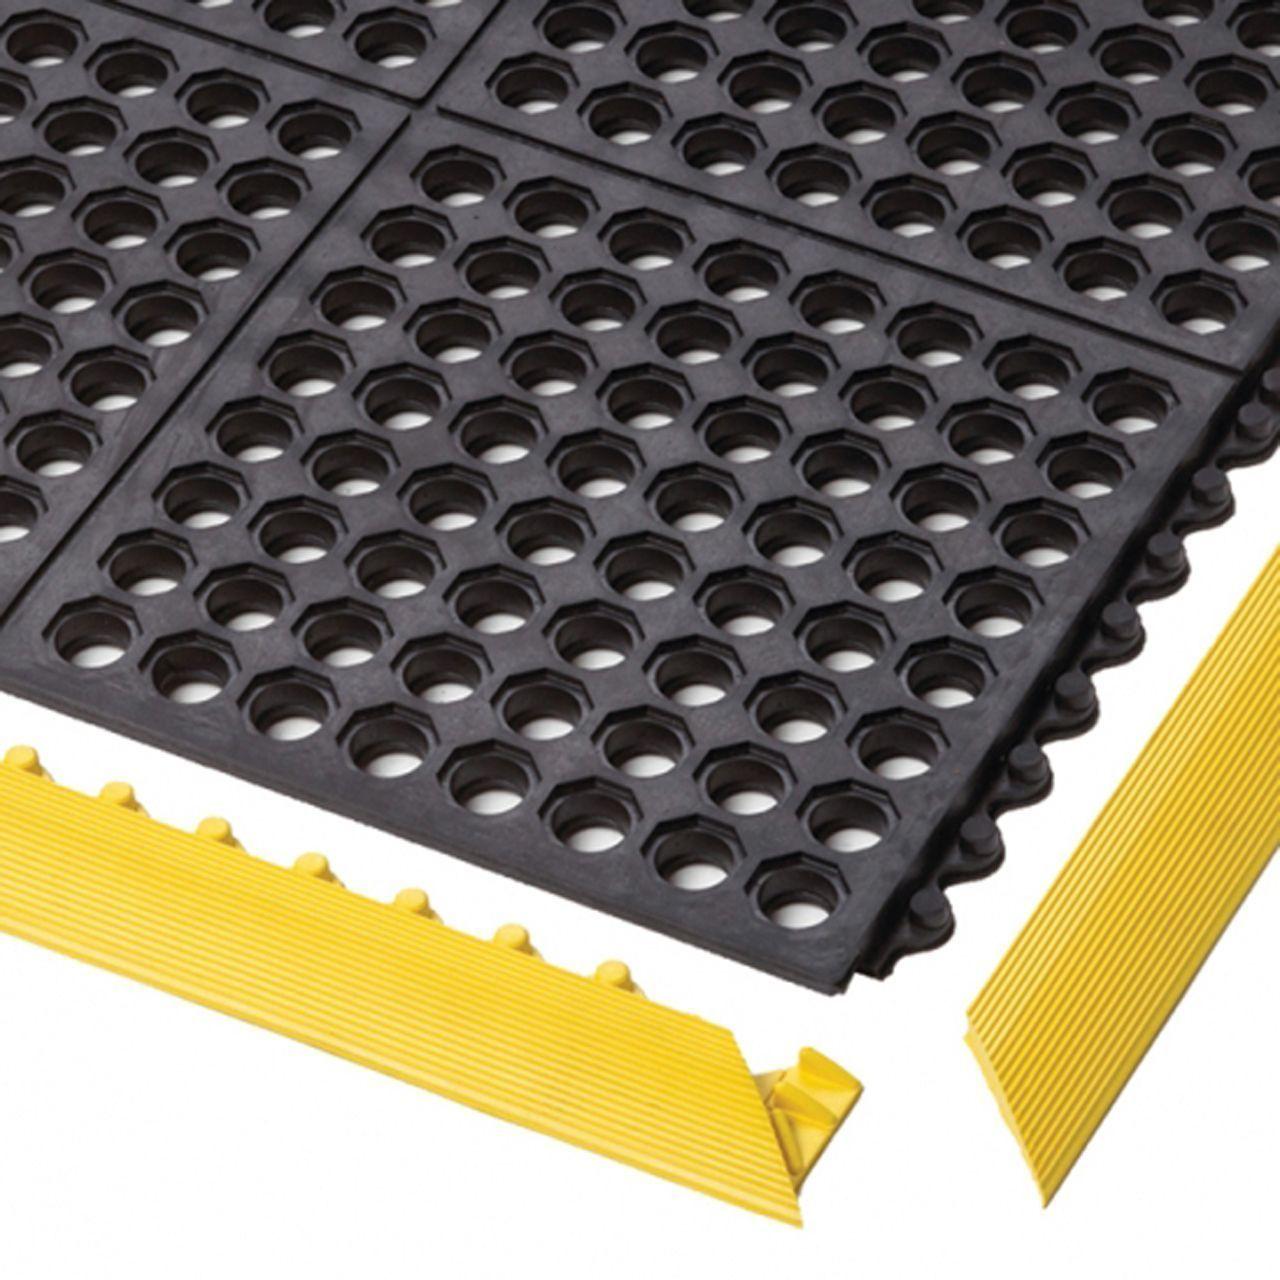 cushion ease fr anti vermoeidheidsmatten industriele hulpmiddelen 0007s Cushion Ease FR